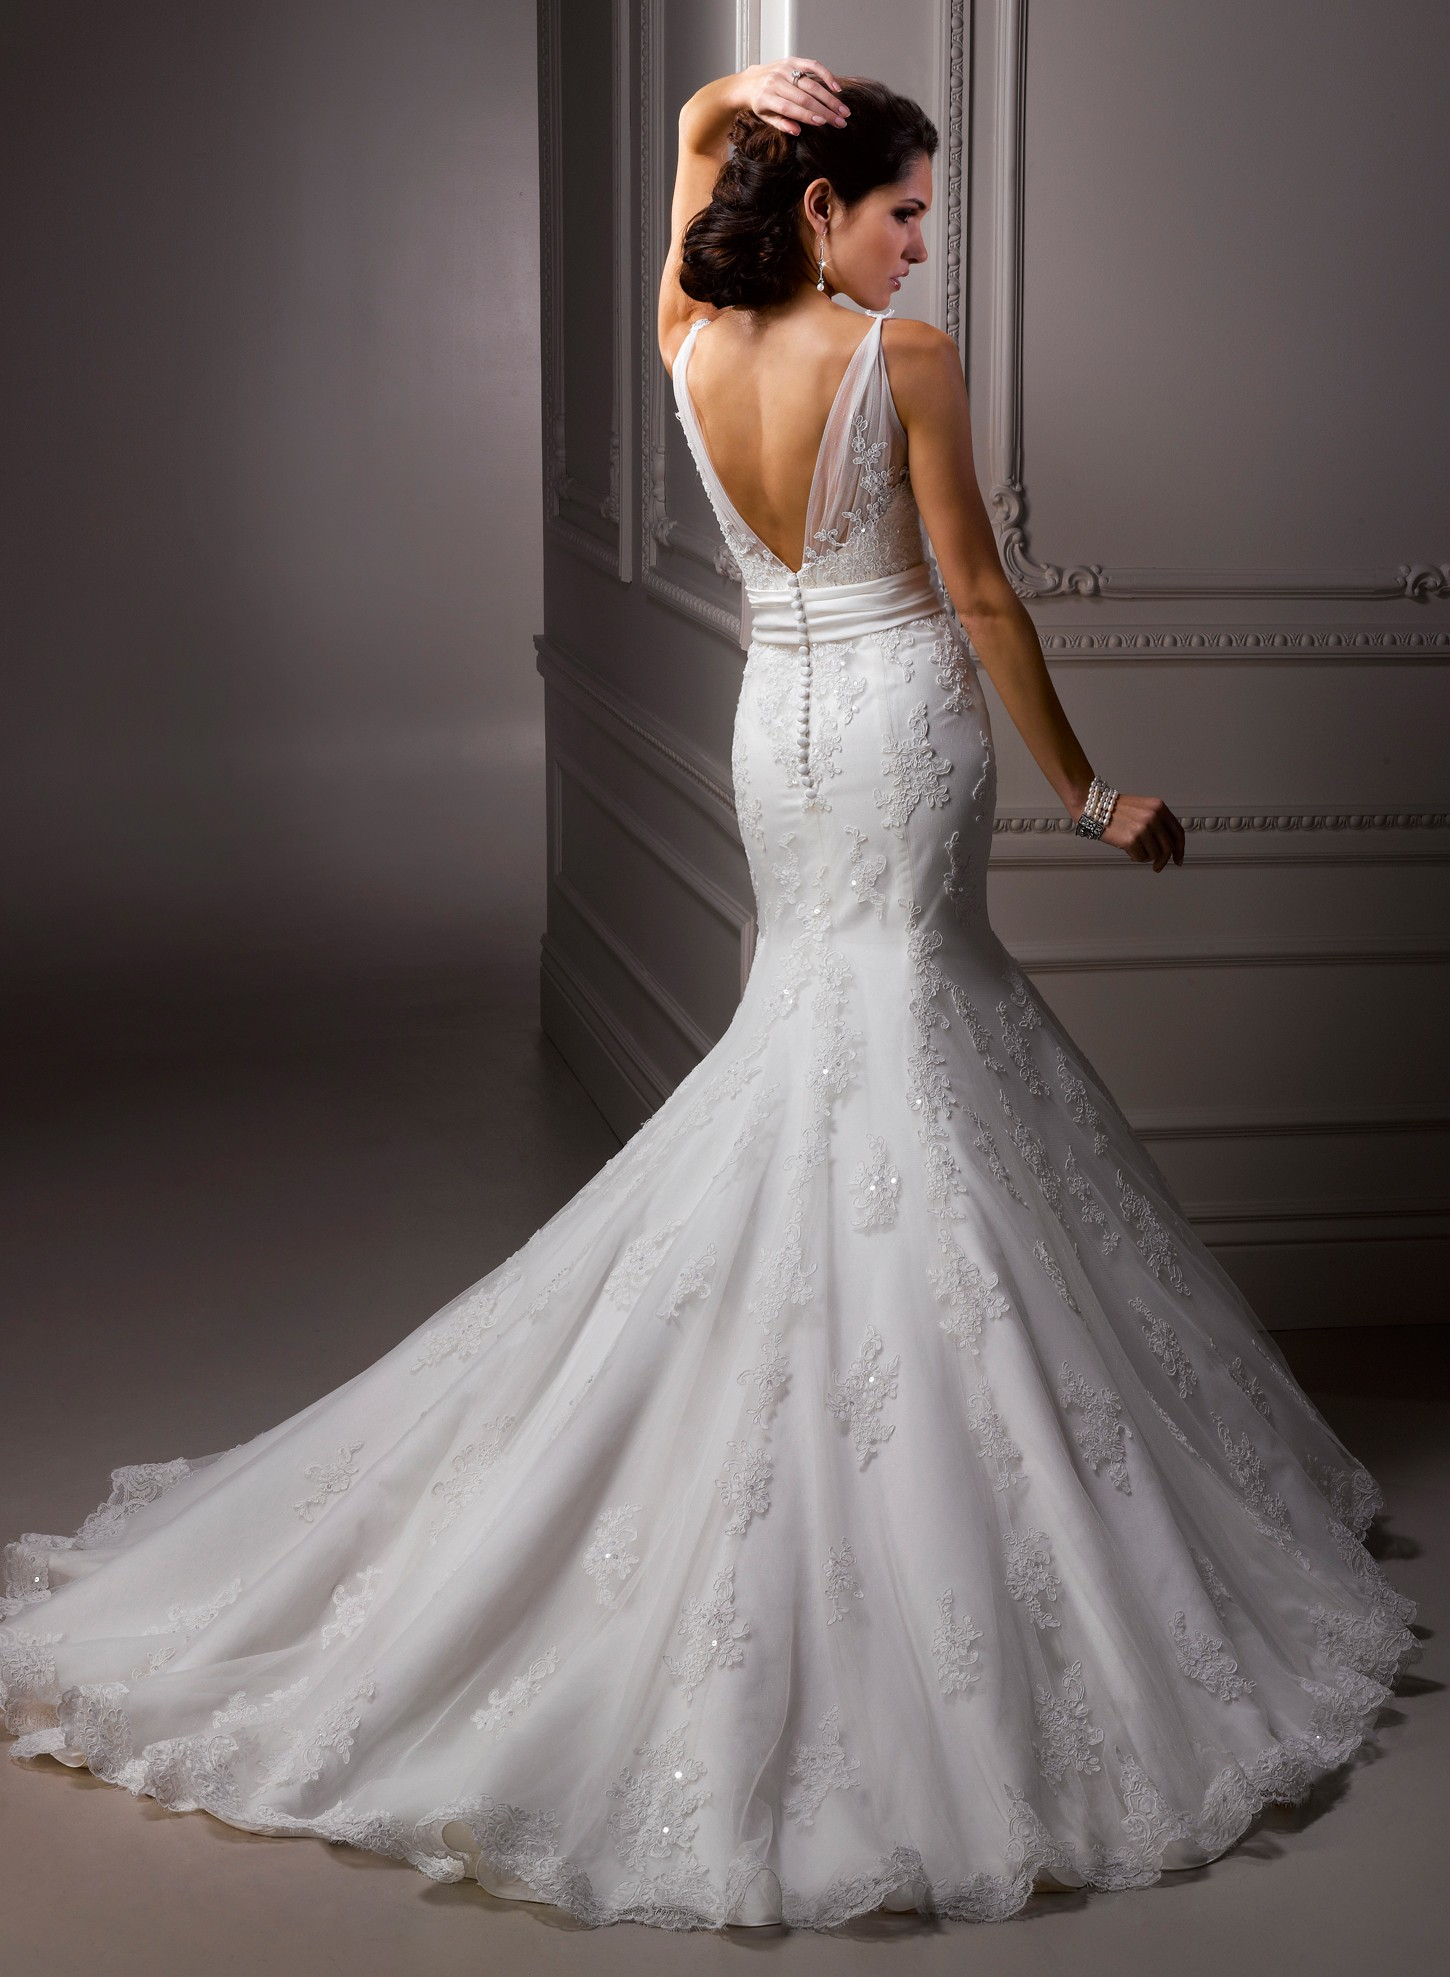 images of mermaid wedding dresses photo - 1